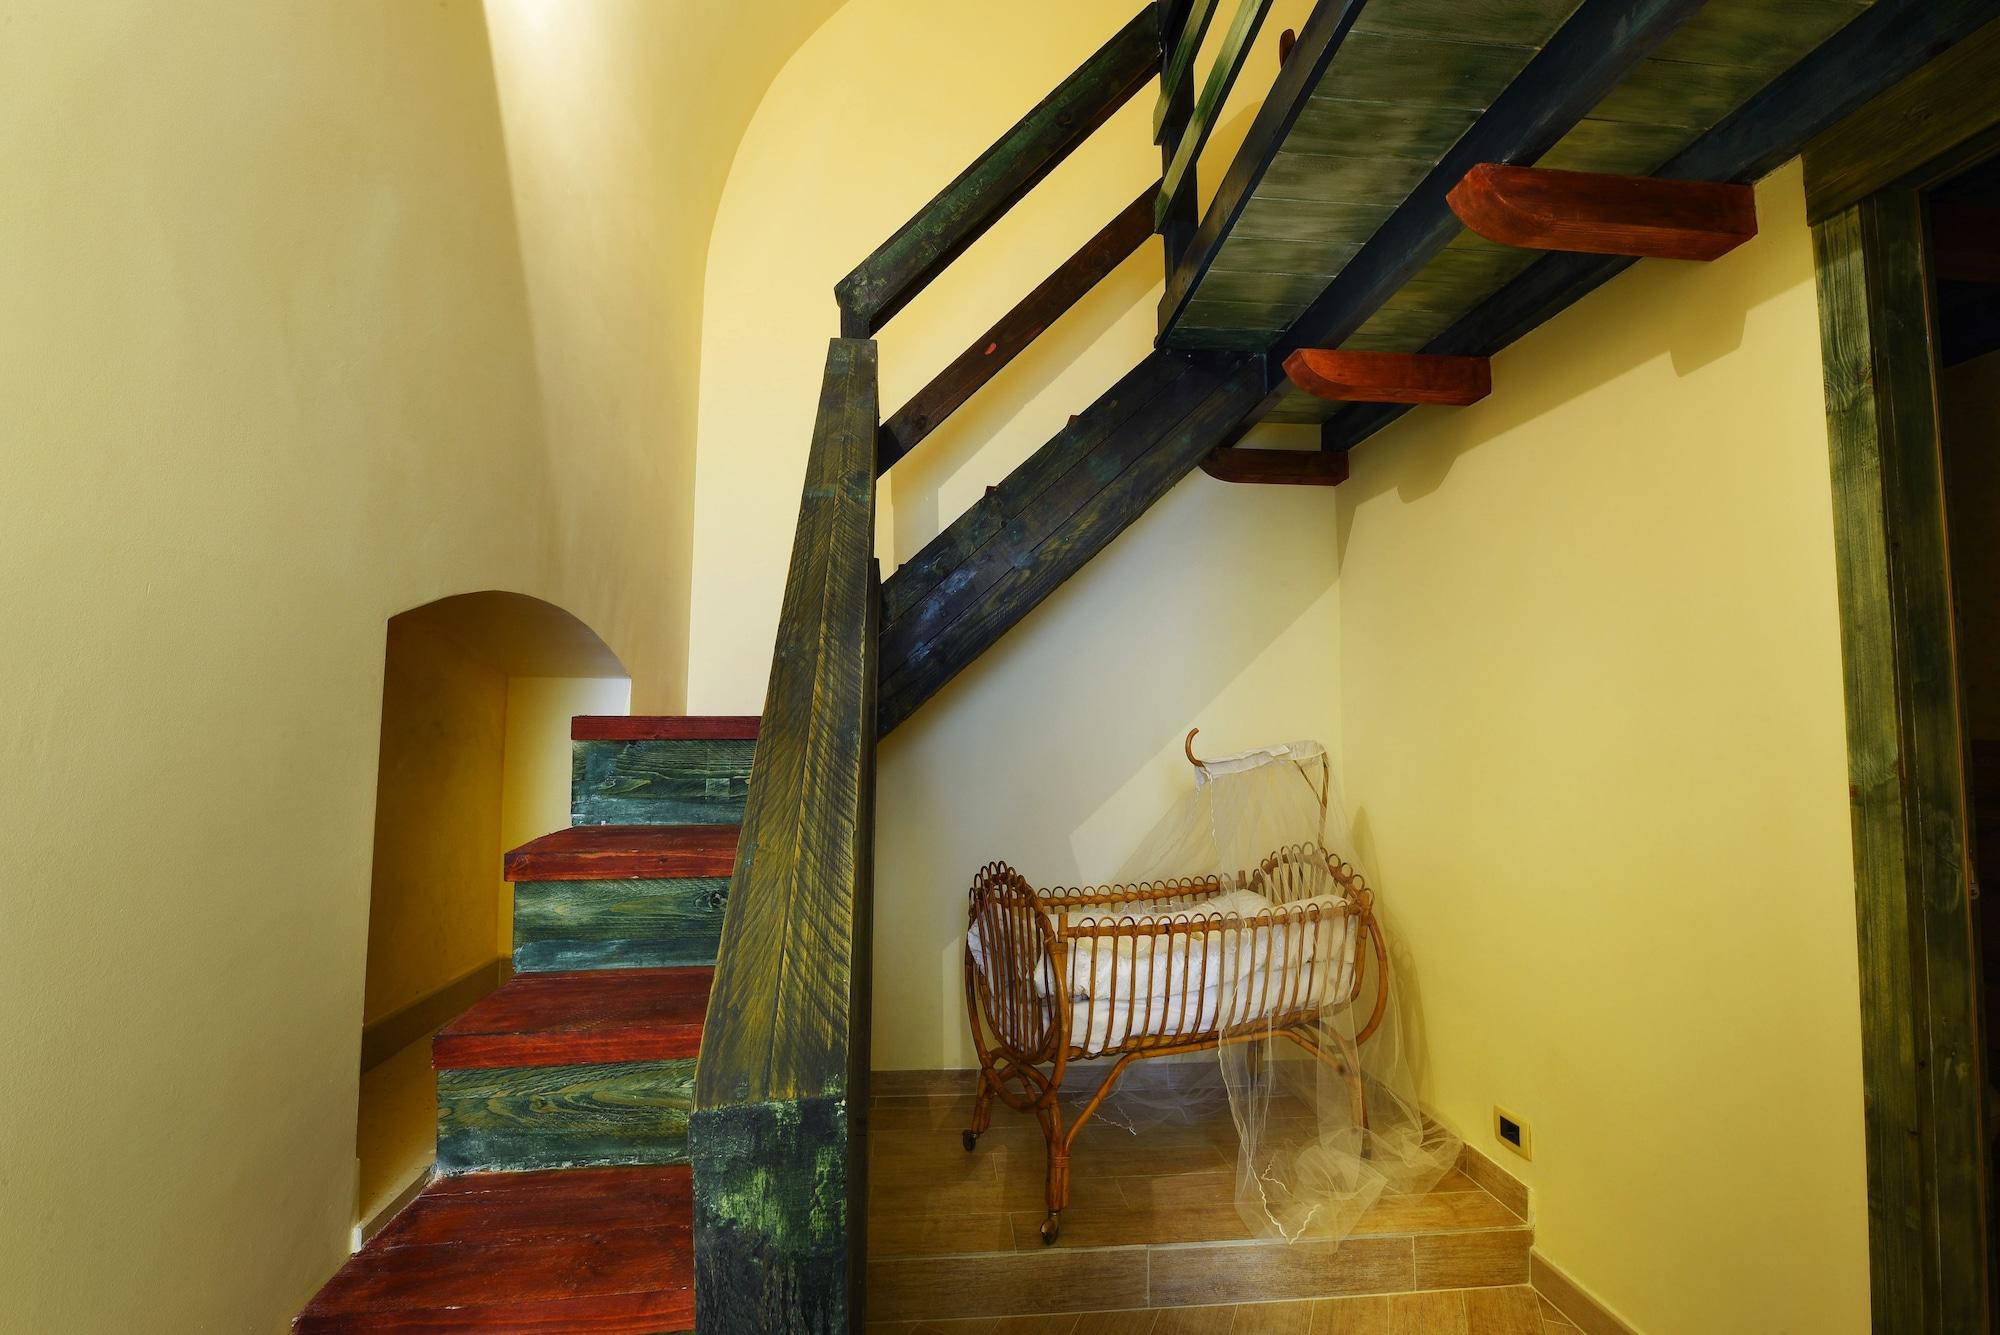 B&B Trani Palace, Barletta-Andria-Trani